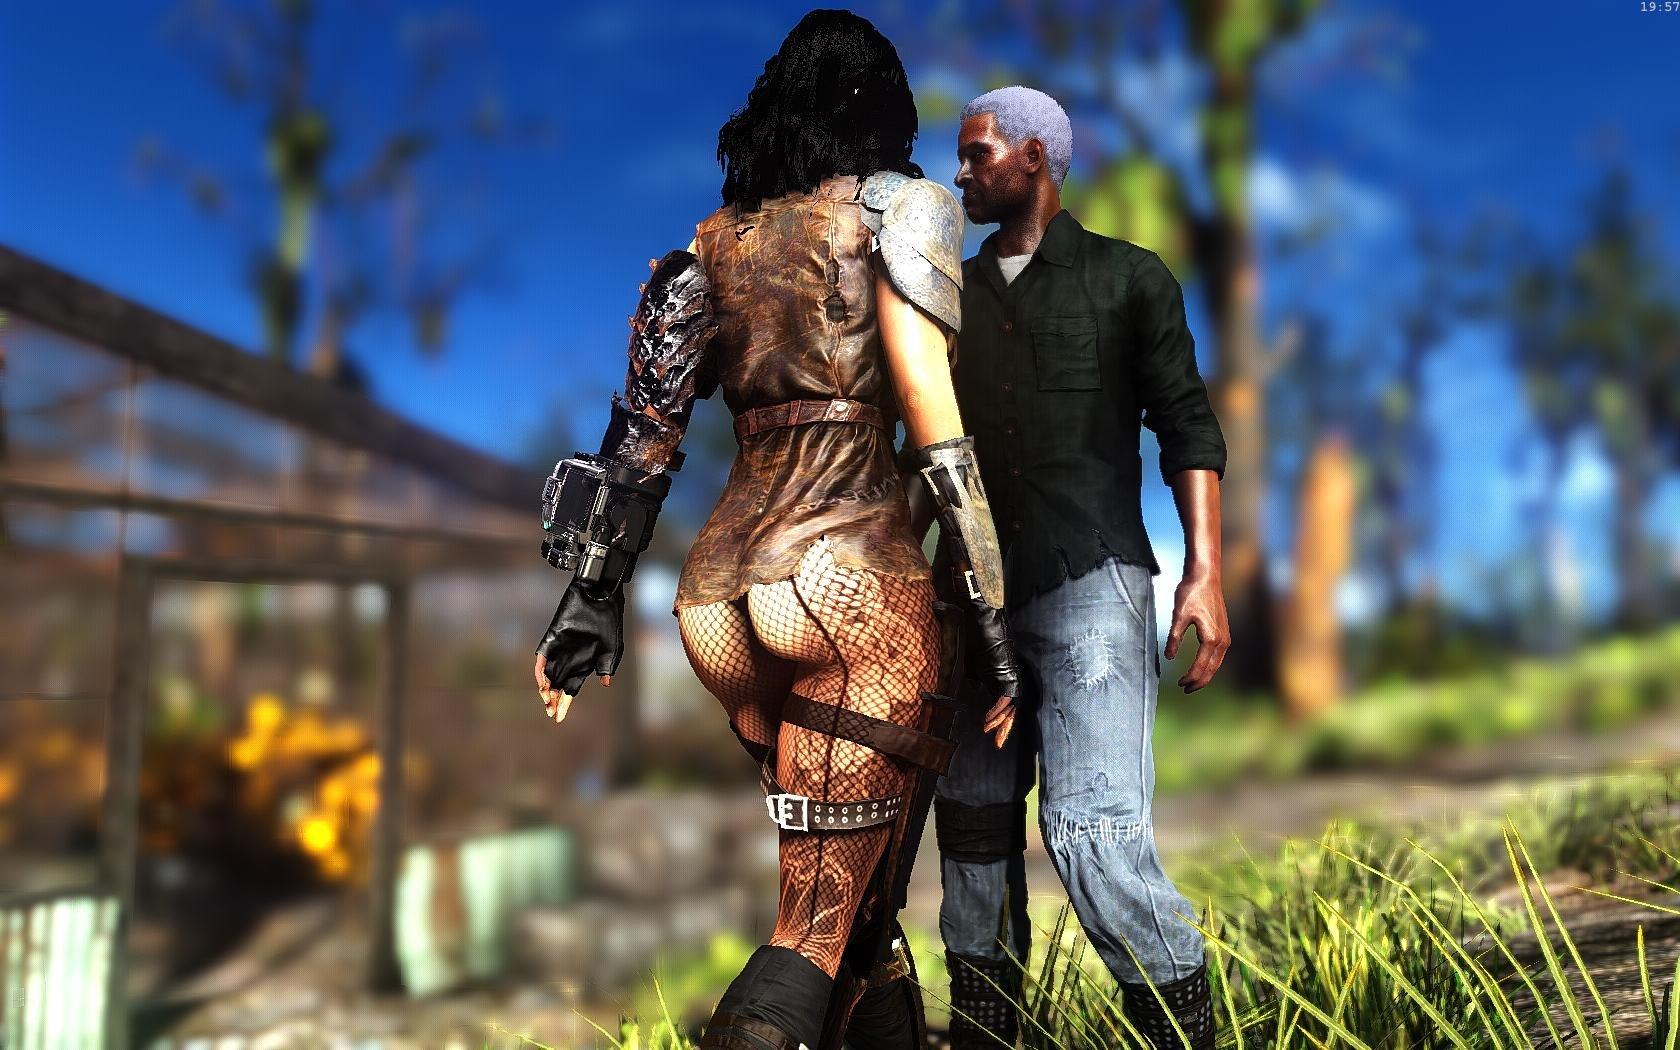 Fallout4 2019-02-03 19-57-36-78